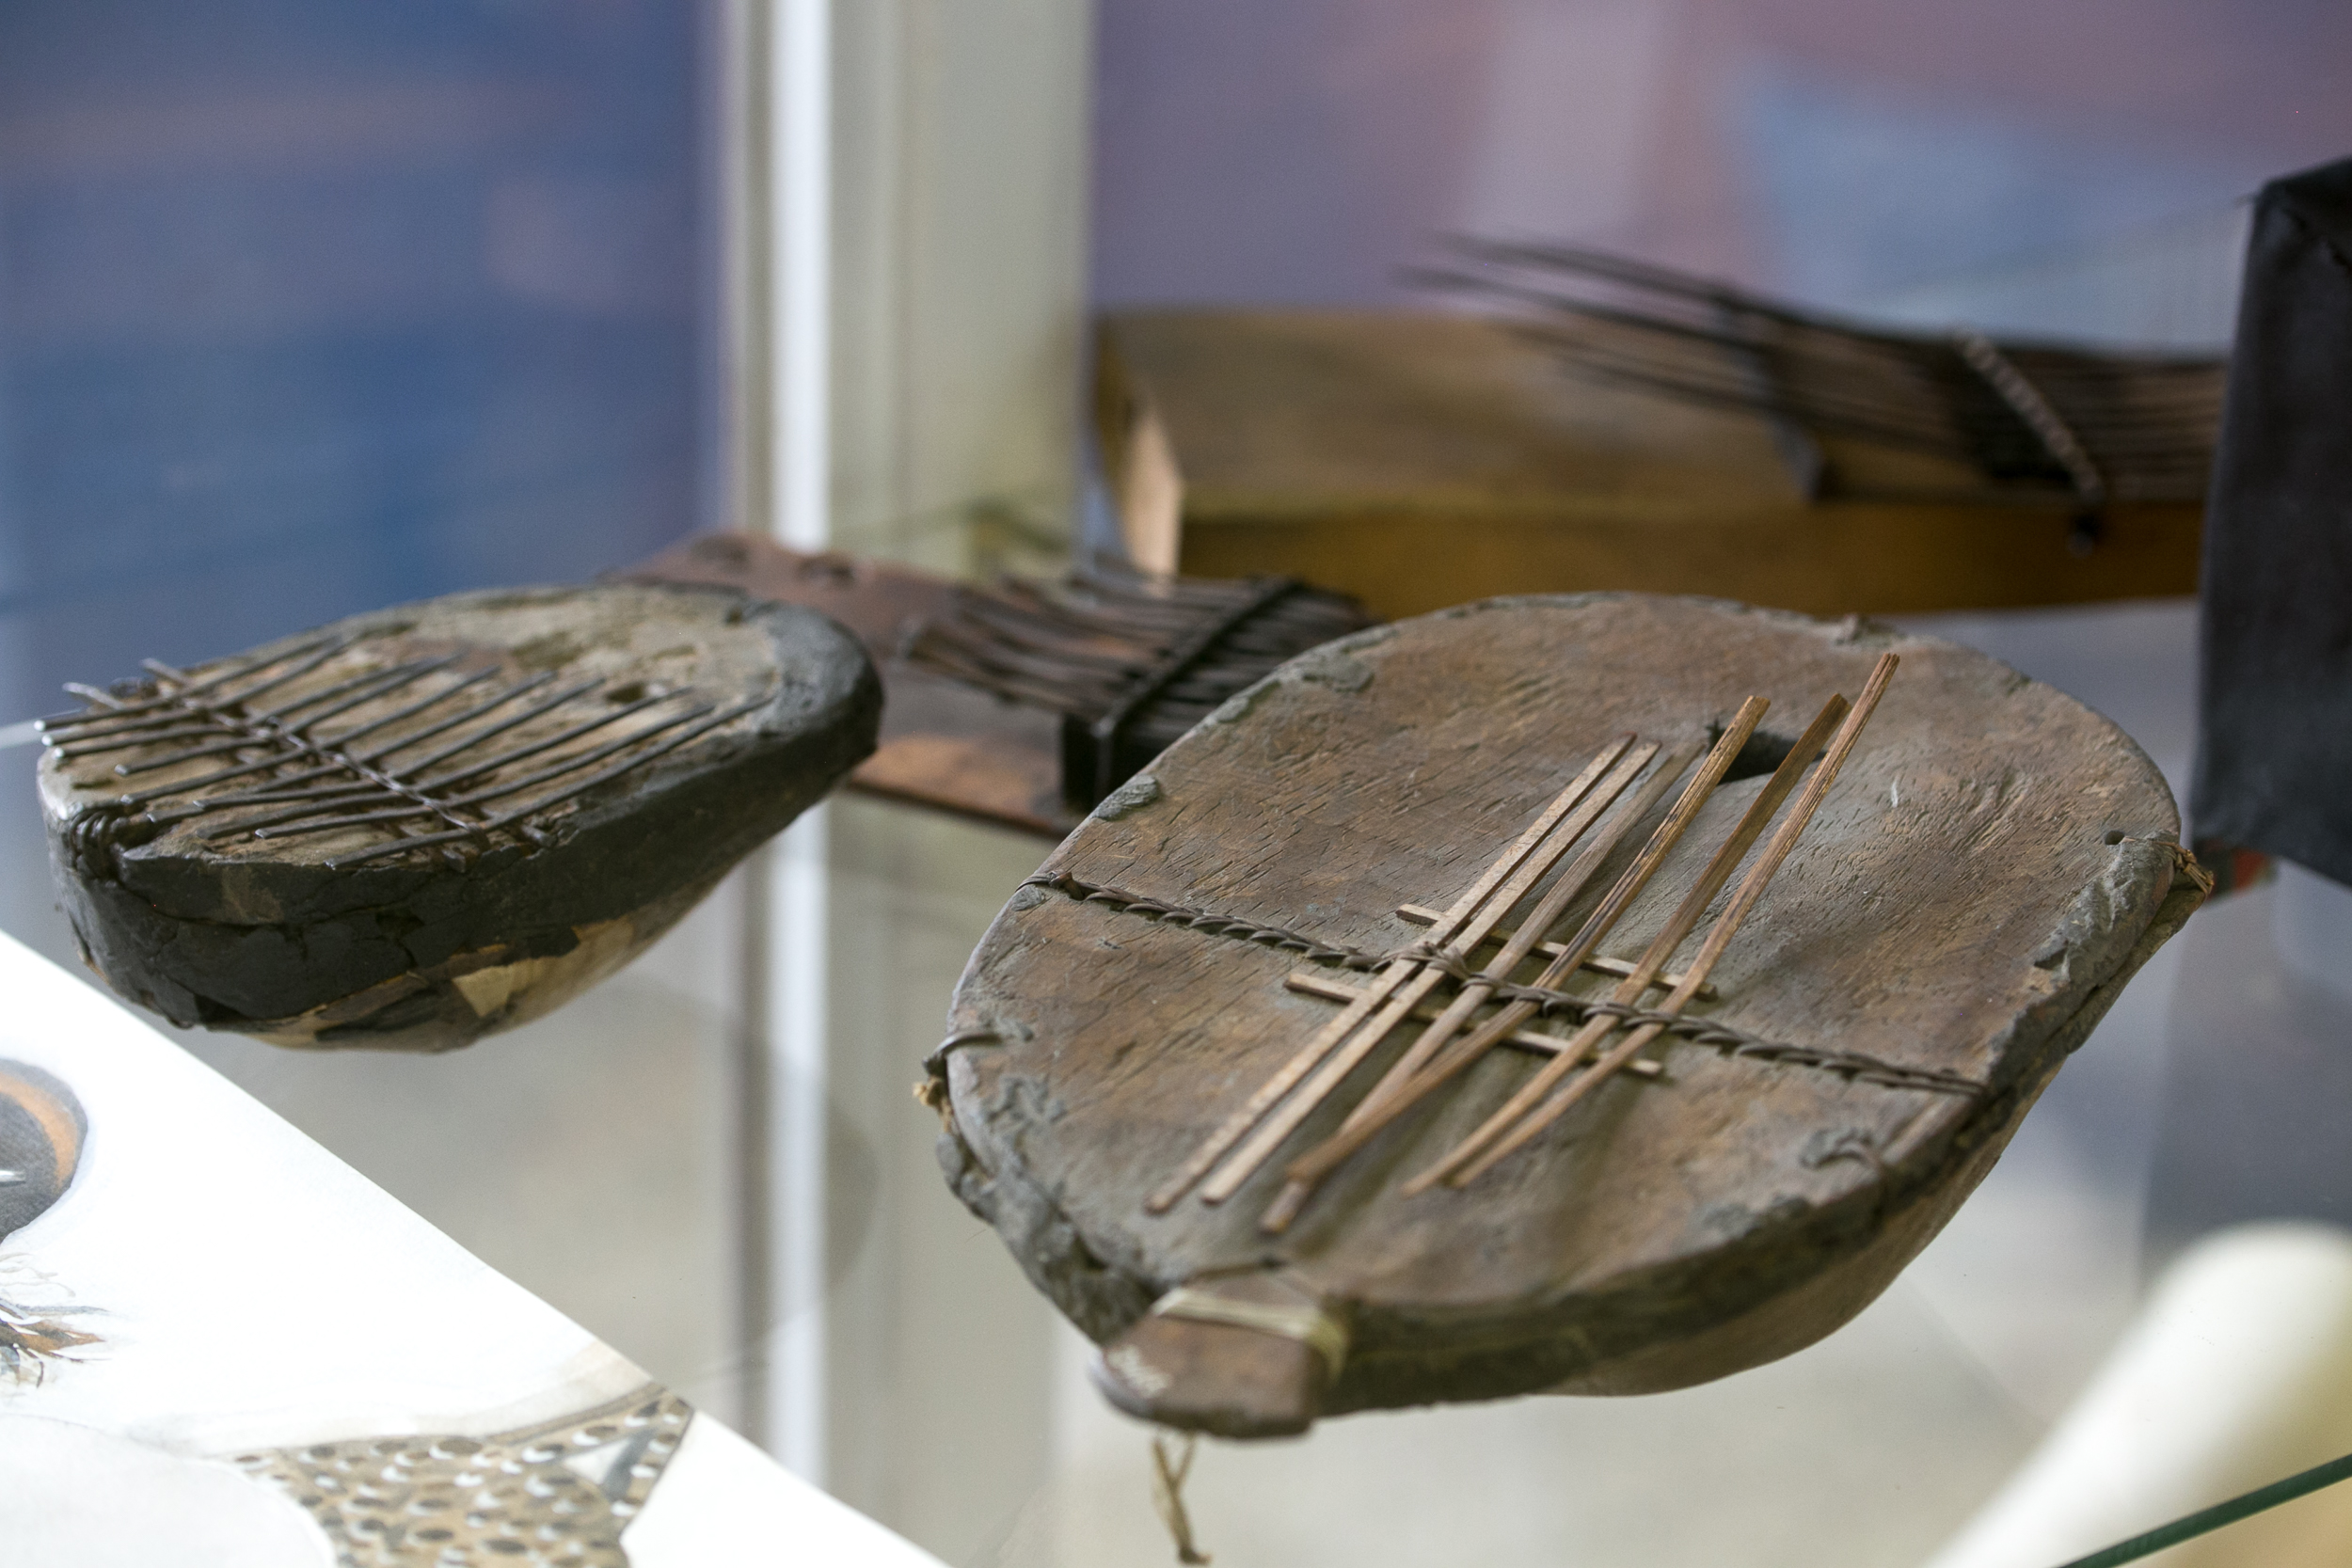 musee-africain-namur-belgique-art-africain-galerie-lz-arts-sanza-instrument-musique-1.jpg